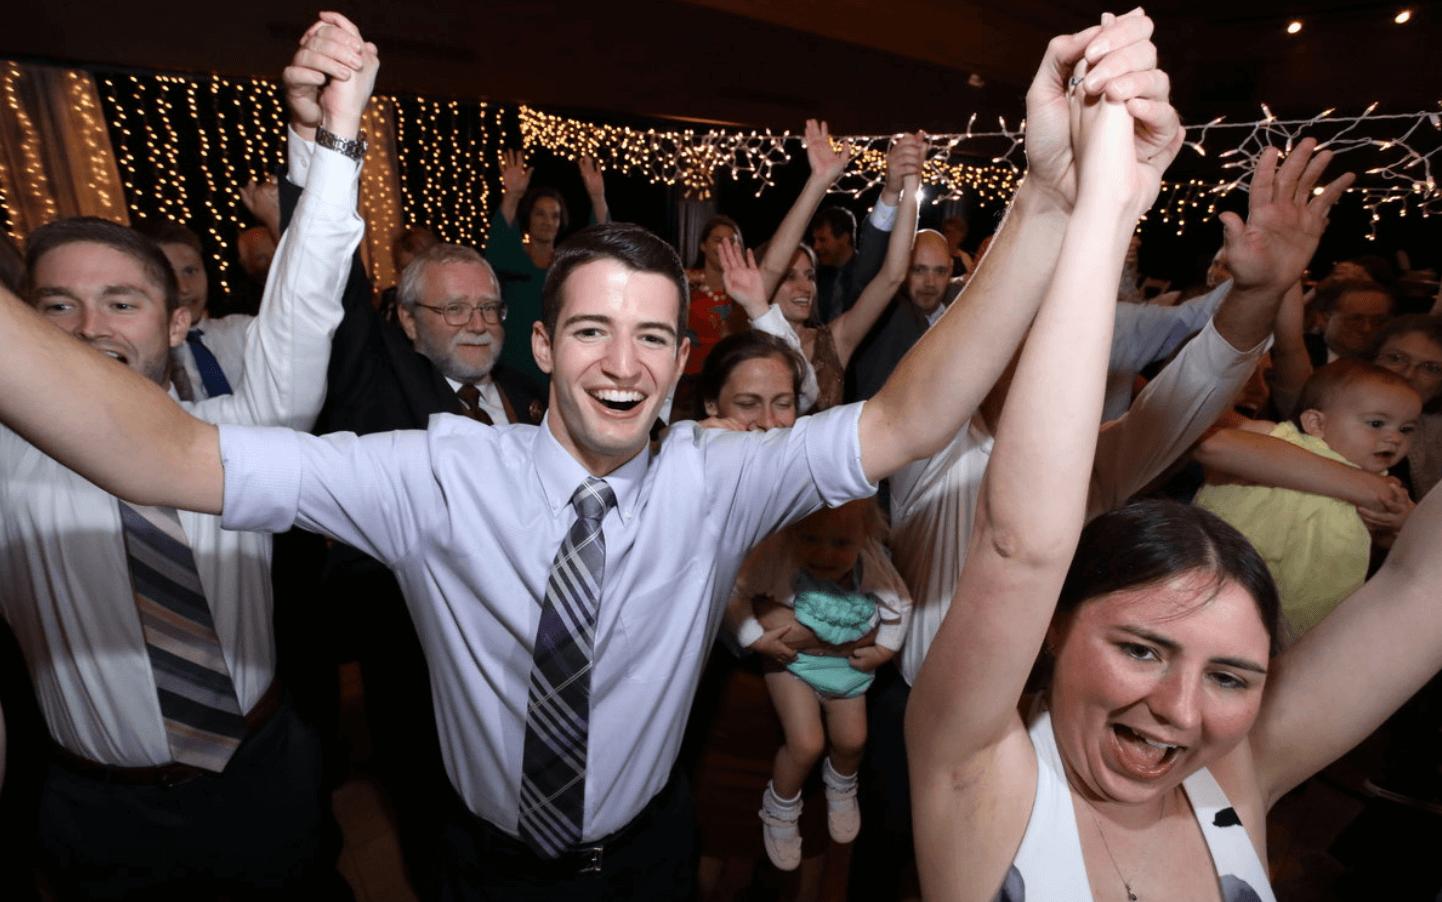 Wedding Dancing.png